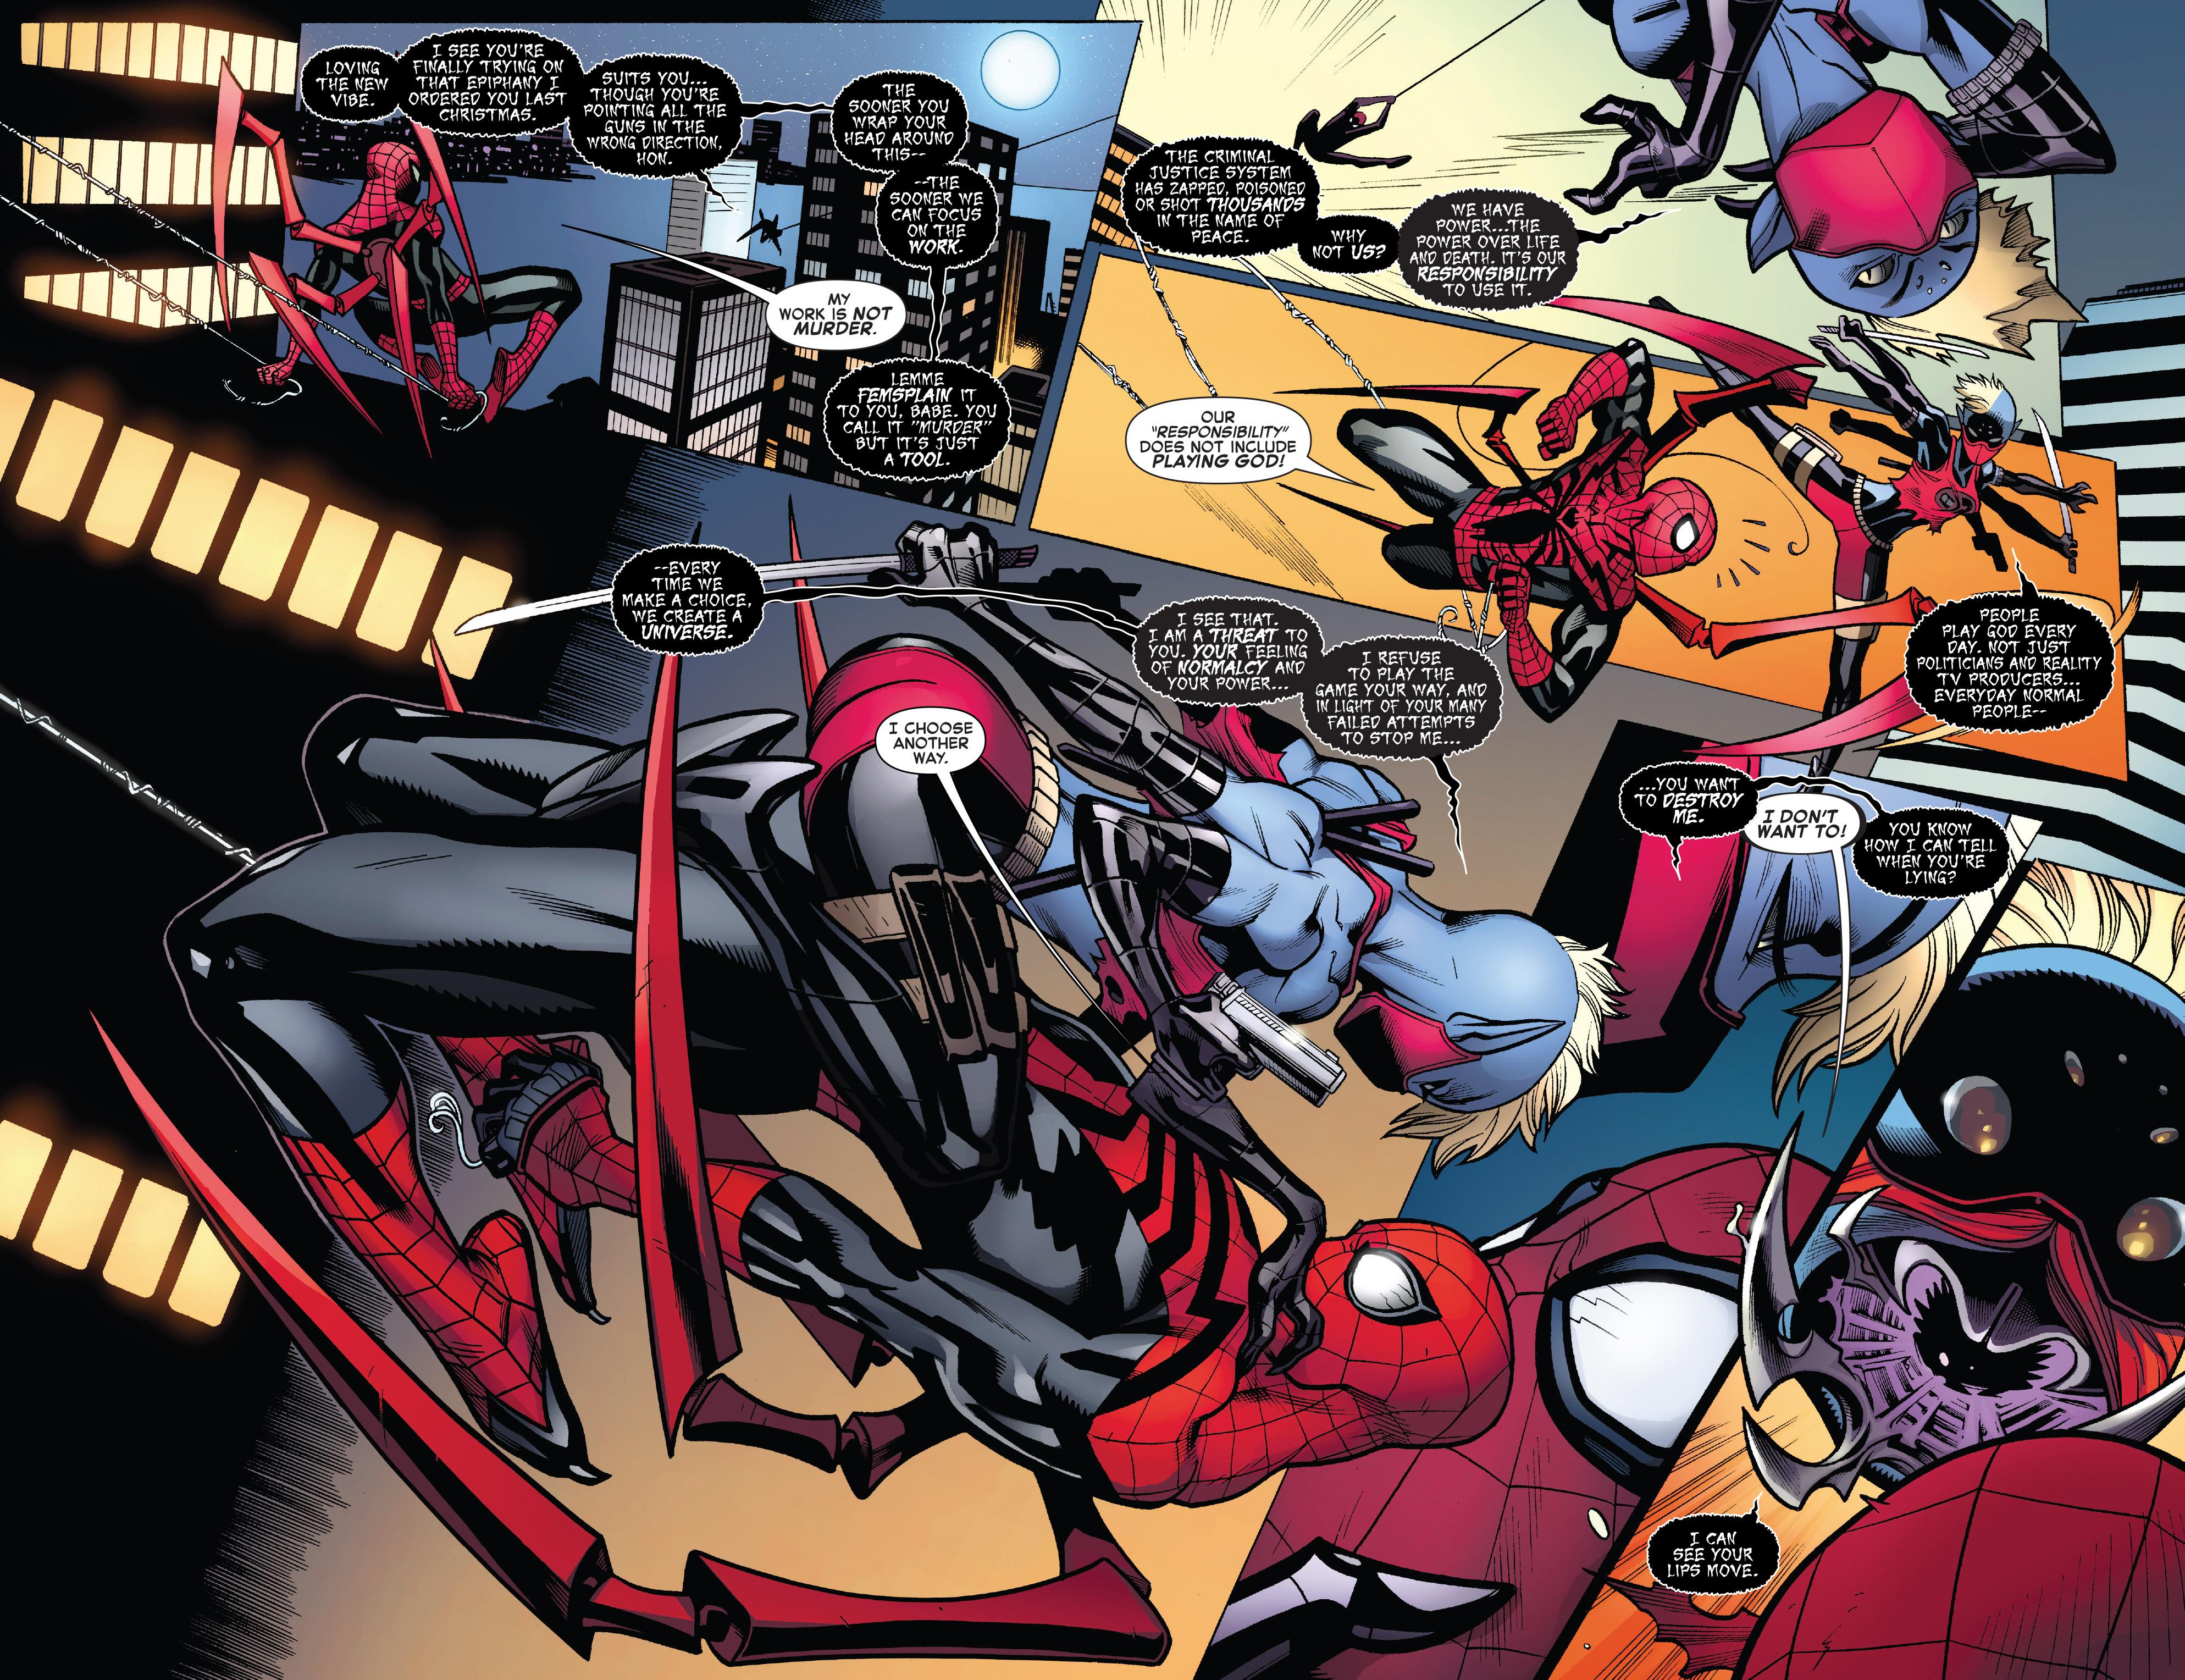 Read online Spider-Man/Deadpool comic -  Issue #17 - 10